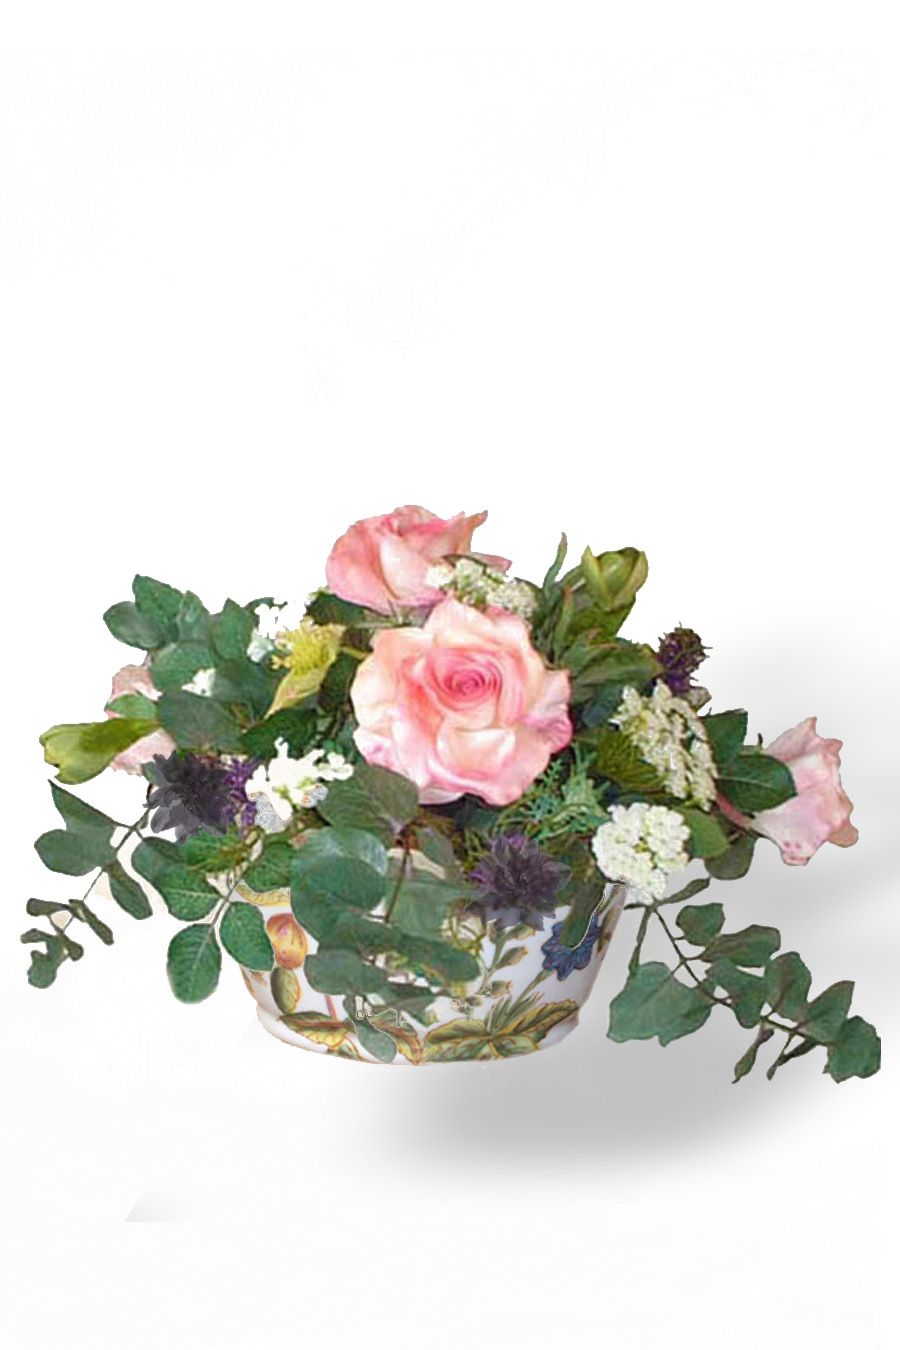 Jacky Silk Flowers Artificial Arrangements Pene Dene